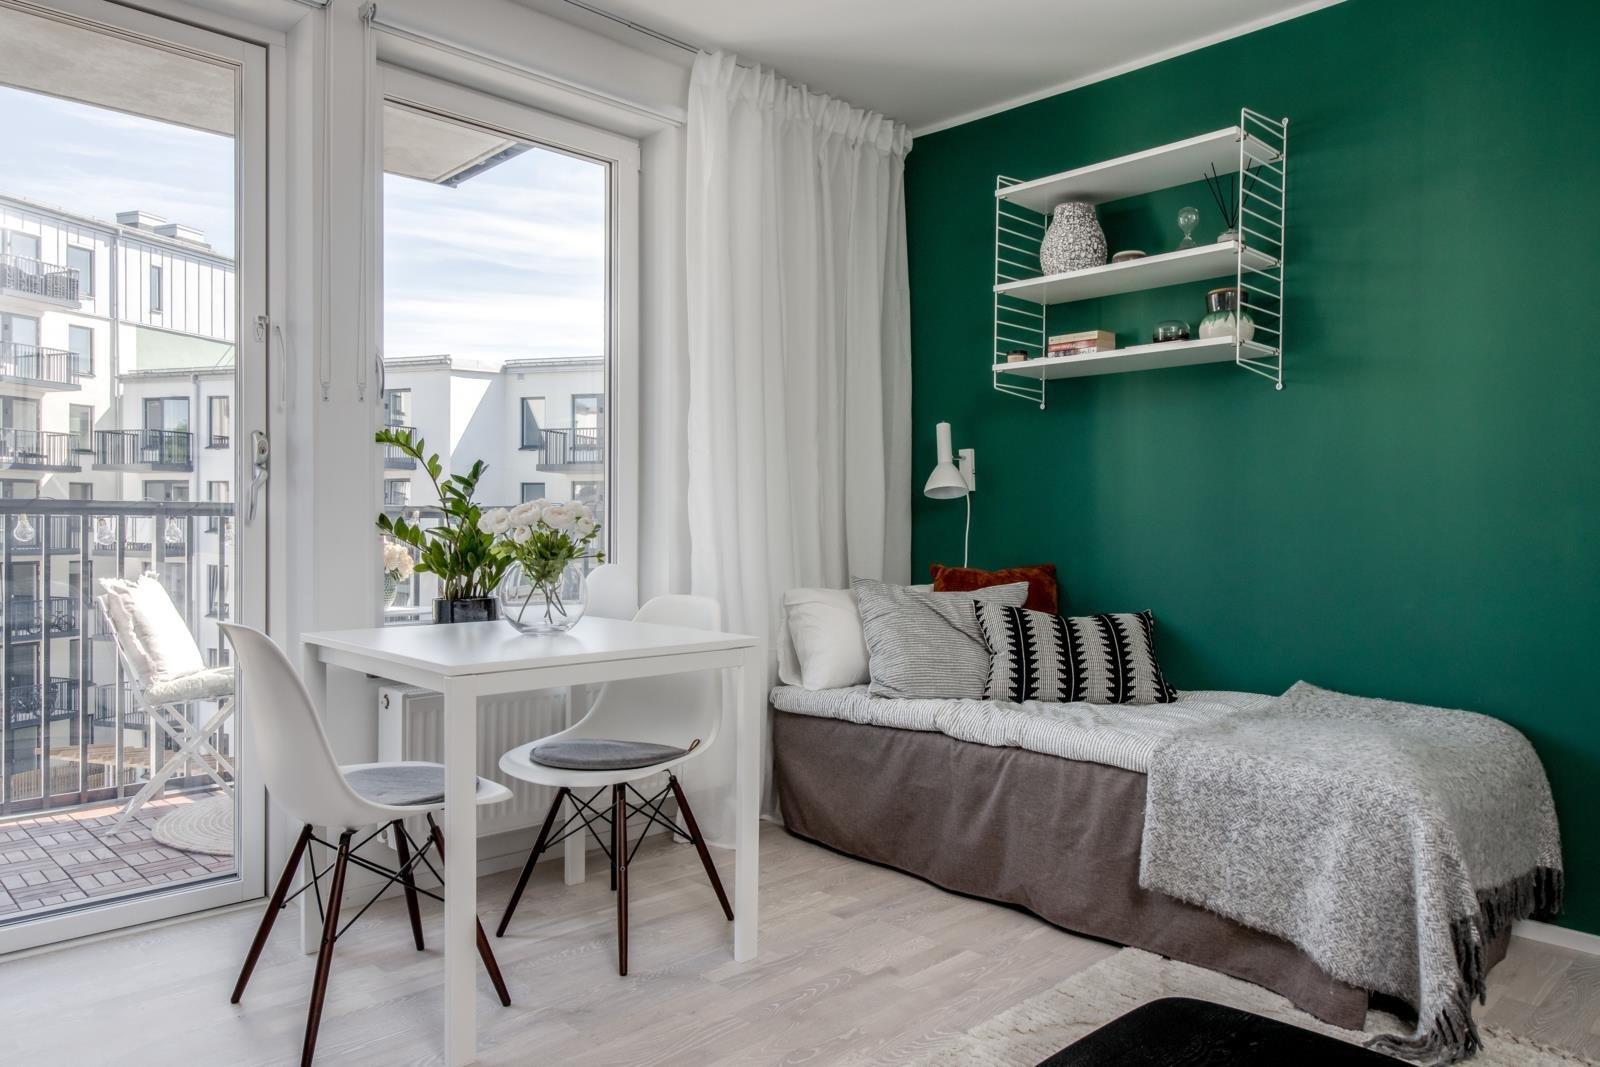 Интерьер шведской квартиры-студии около 26 кв.